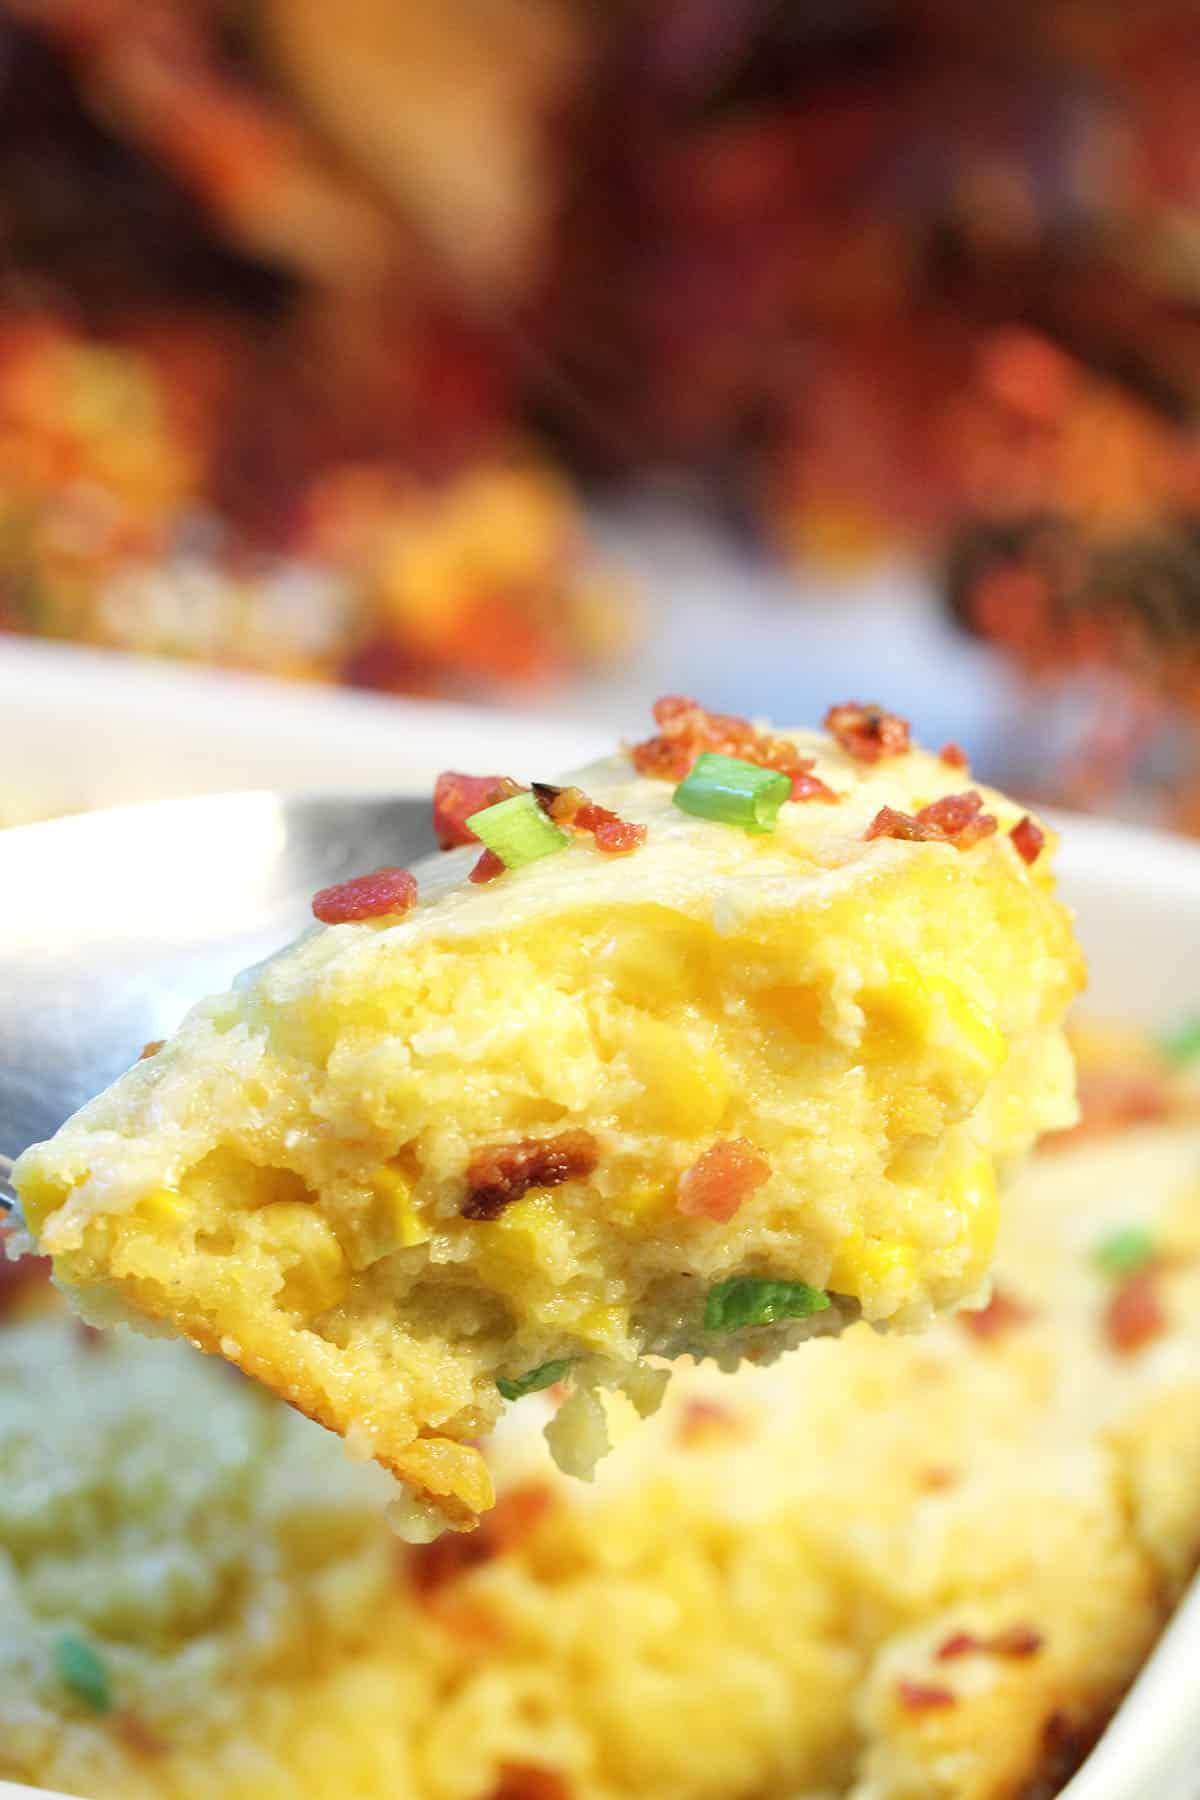 Spoonful of cheesy corn pudding over casserole.